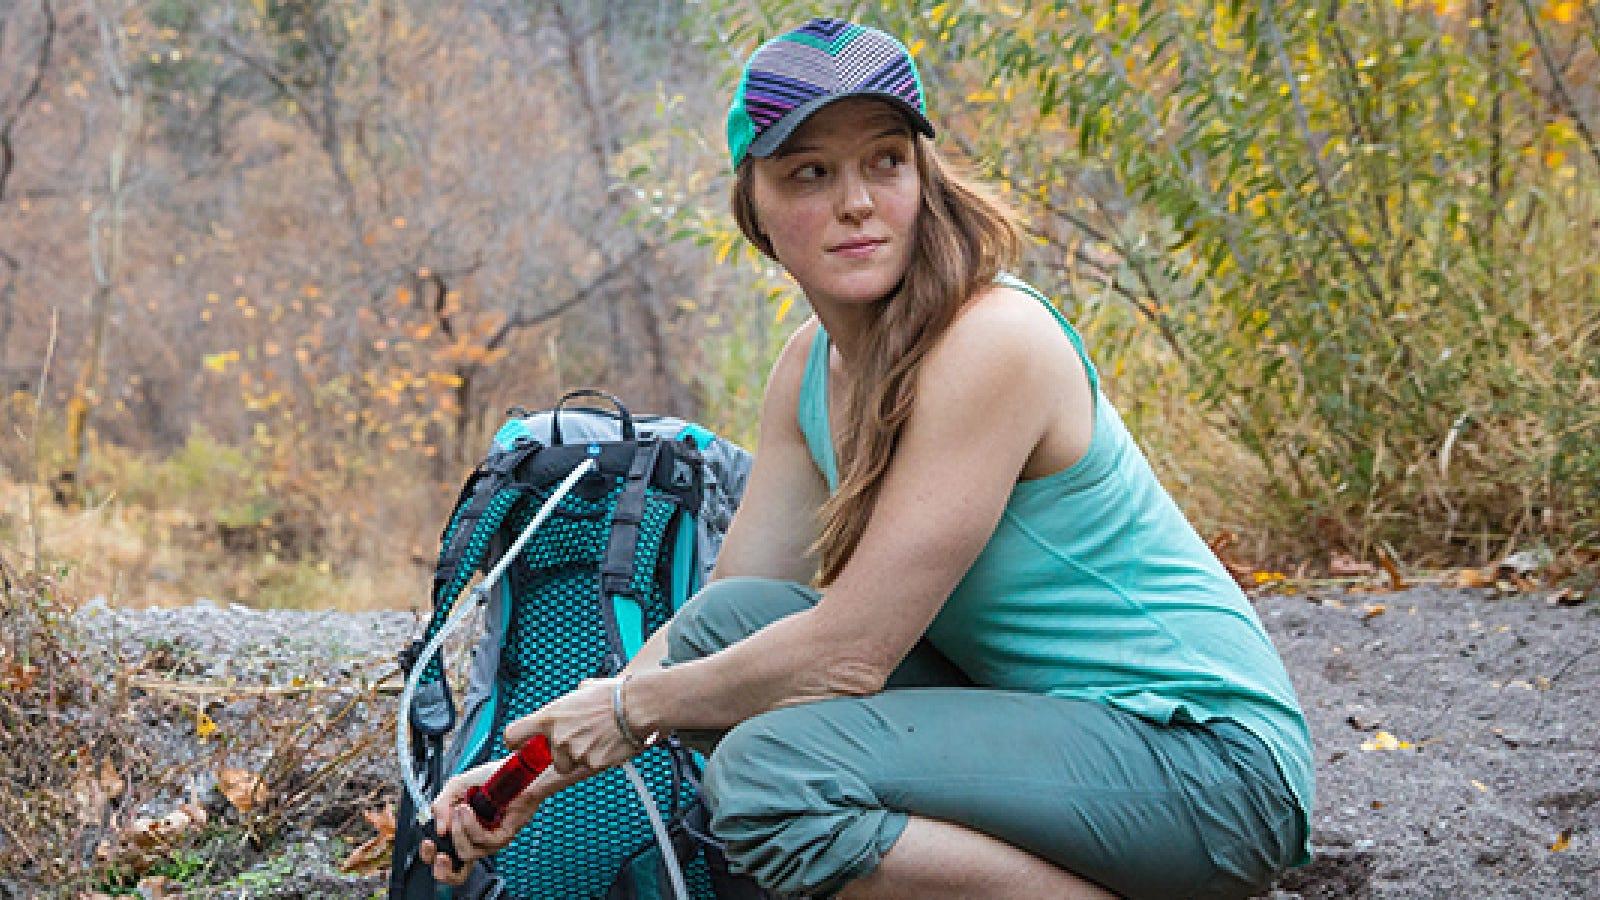 A hiker filling her Osprey hydration reservoir on a hiking trail.